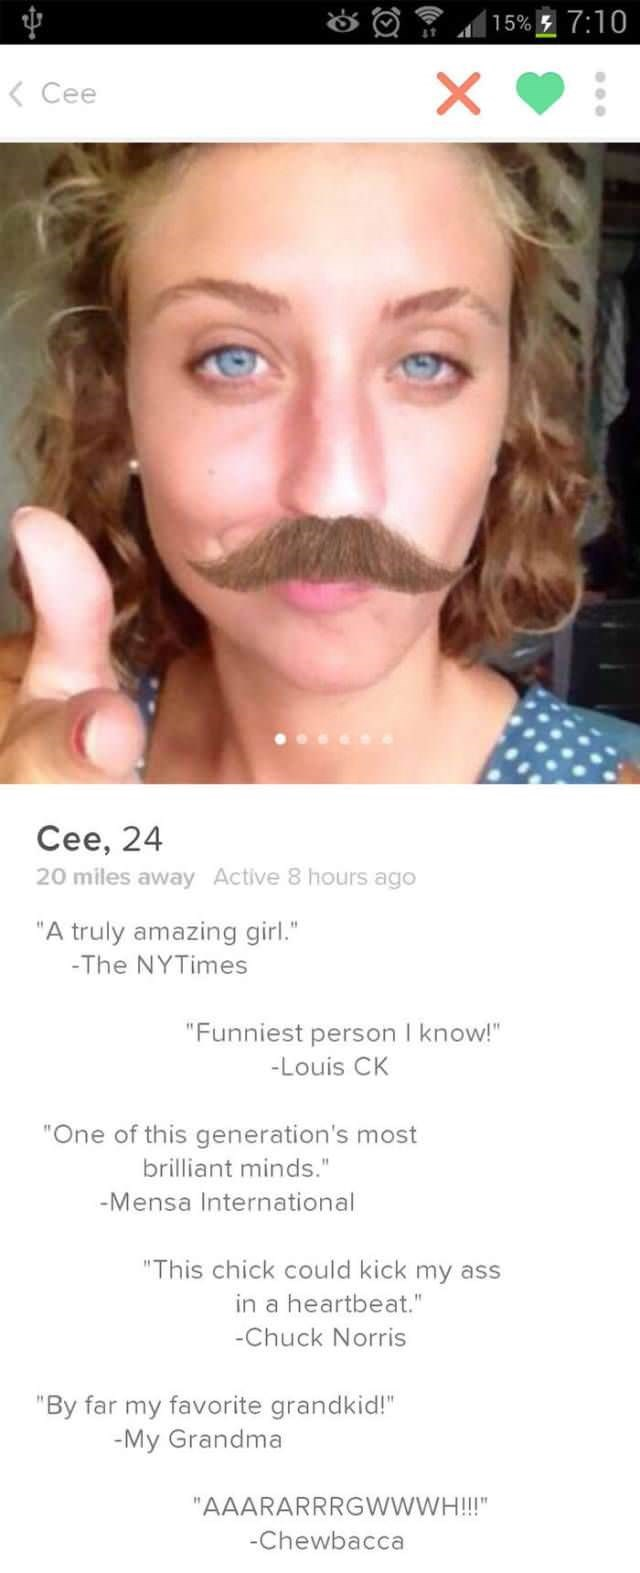 44 Hilarious Tinder Profiles Wed Definitely Right Swipe On